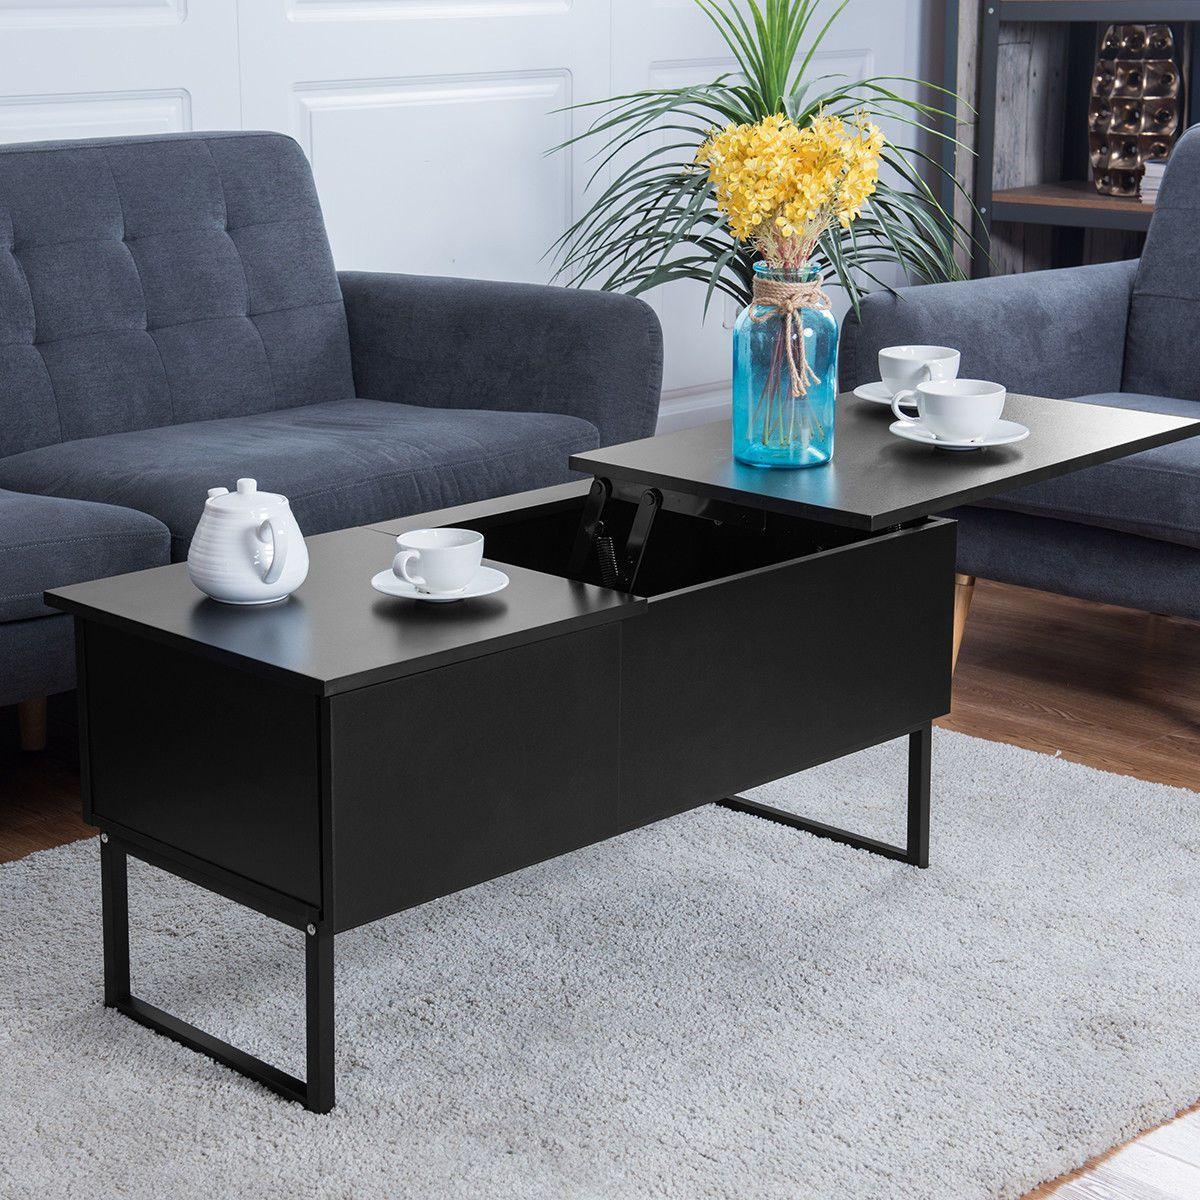 Modern Lift Top Coffee Table Living Room Coffee Table Coffee Table Living Room Furniture Sofas [ 1200 x 1200 Pixel ]